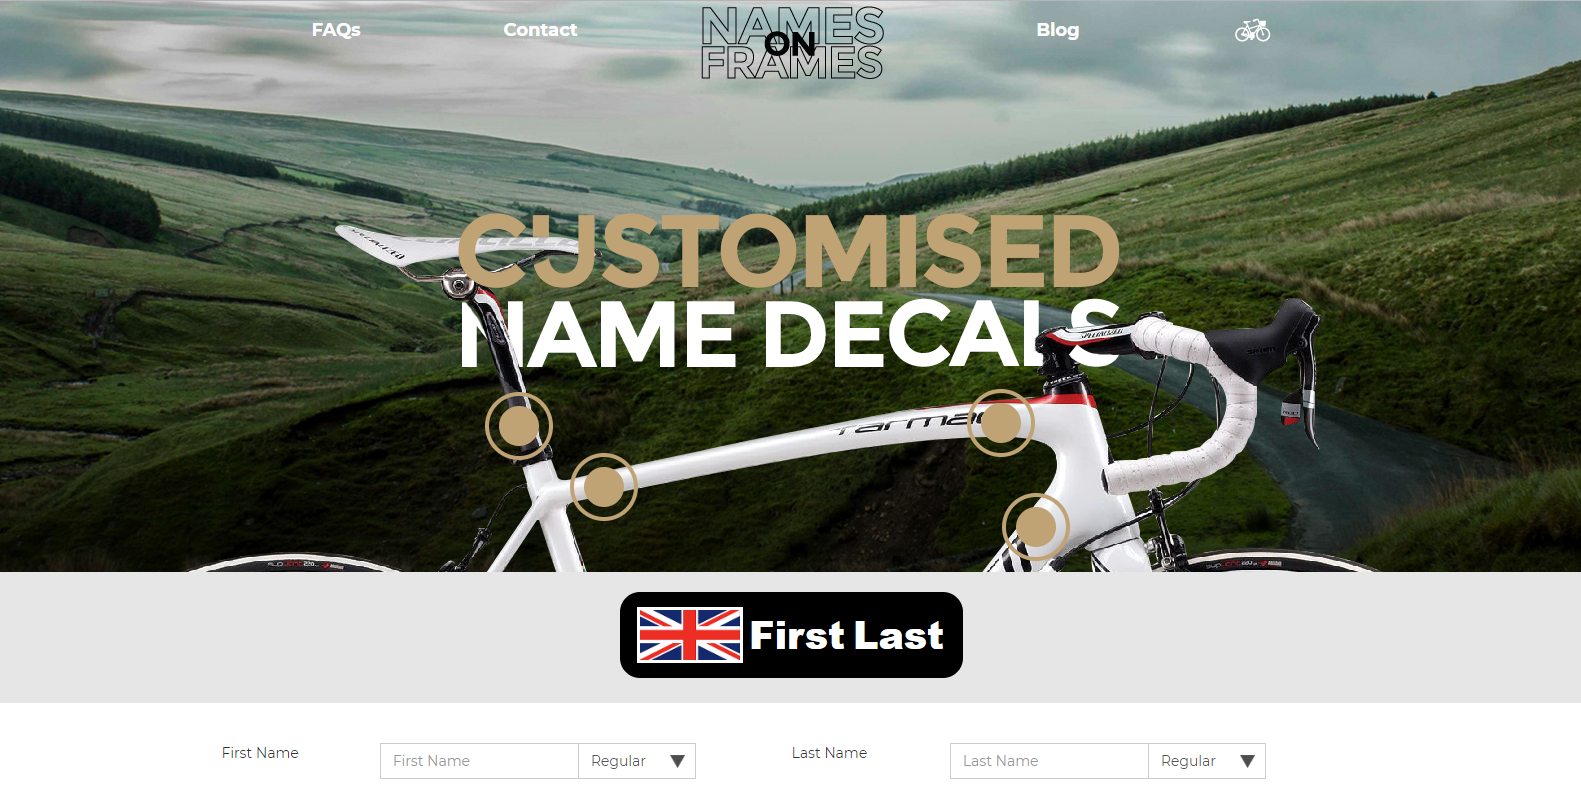 Bike-Decals-Names-On-Frames